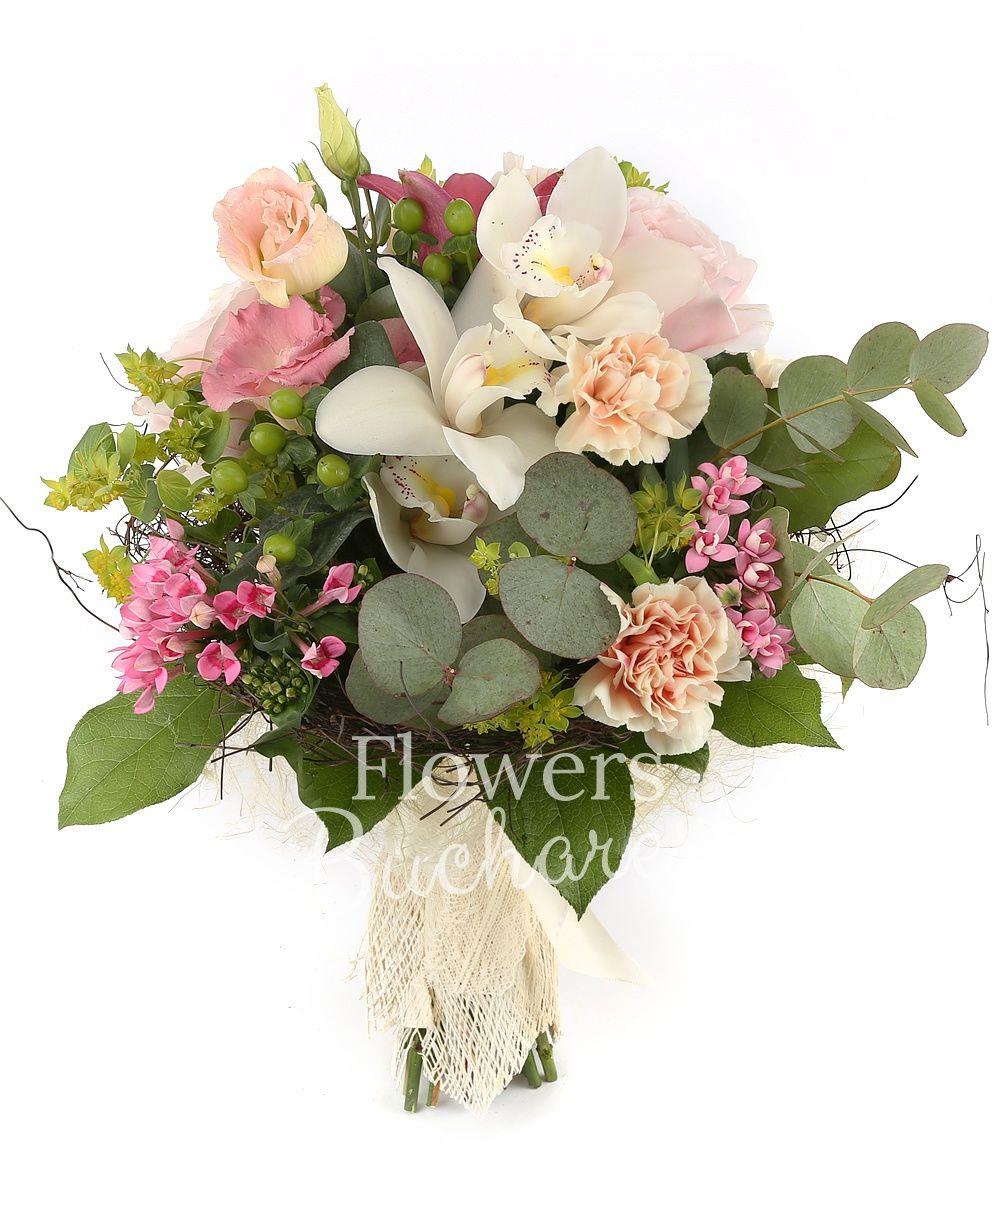 3  pink roses, 2 pink lisianthus, 3 cream carnations, 1 pink lily, 3 pink bouvardia, 3 green hypericum, white cymbidium, green cymbidium, bupleurum, greenery